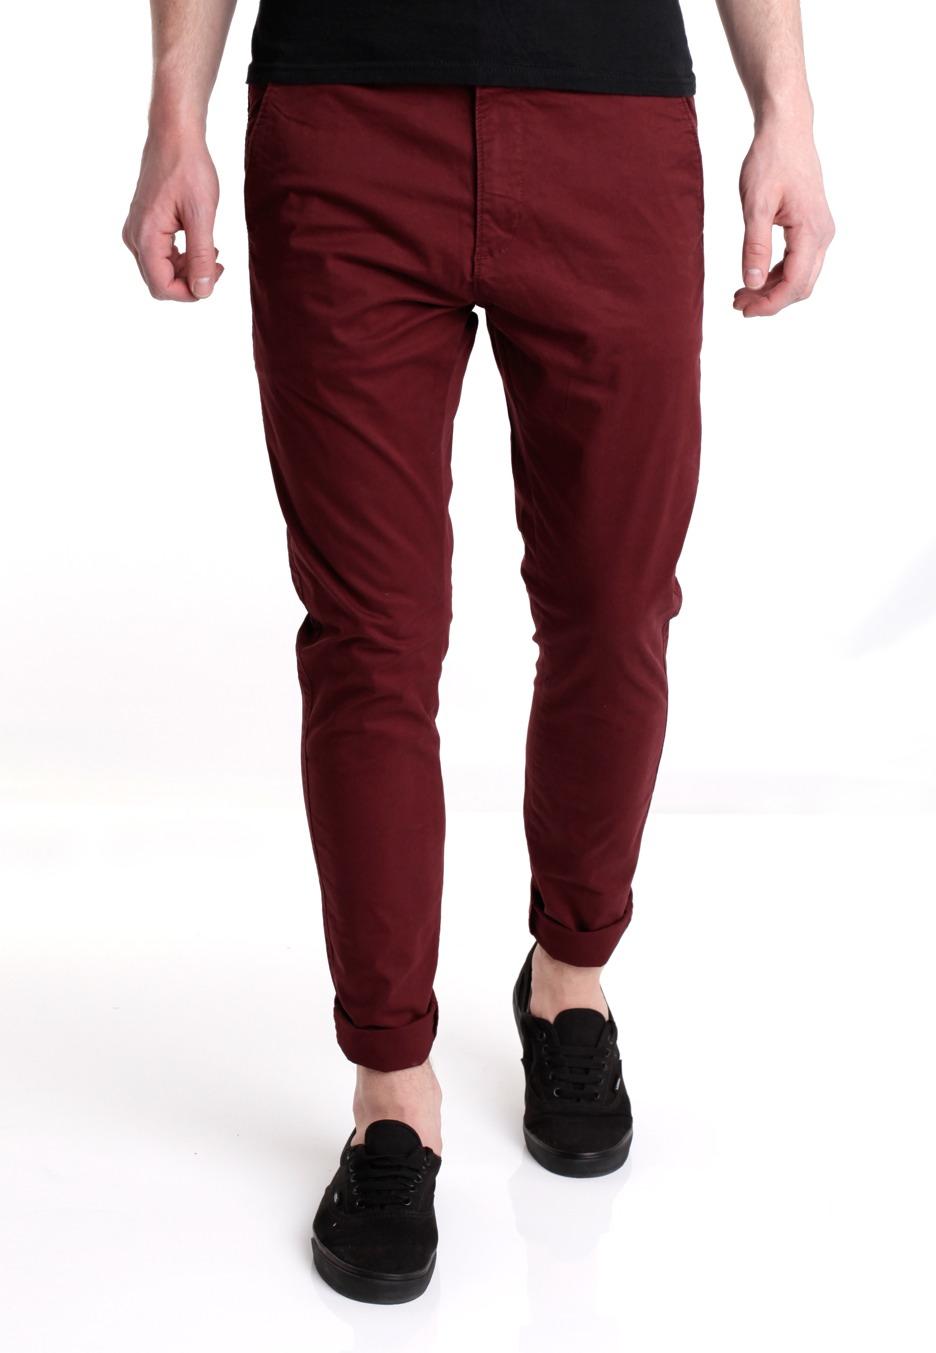 dr denim heywood burgundy pants streetwear shop worldwide. Black Bedroom Furniture Sets. Home Design Ideas